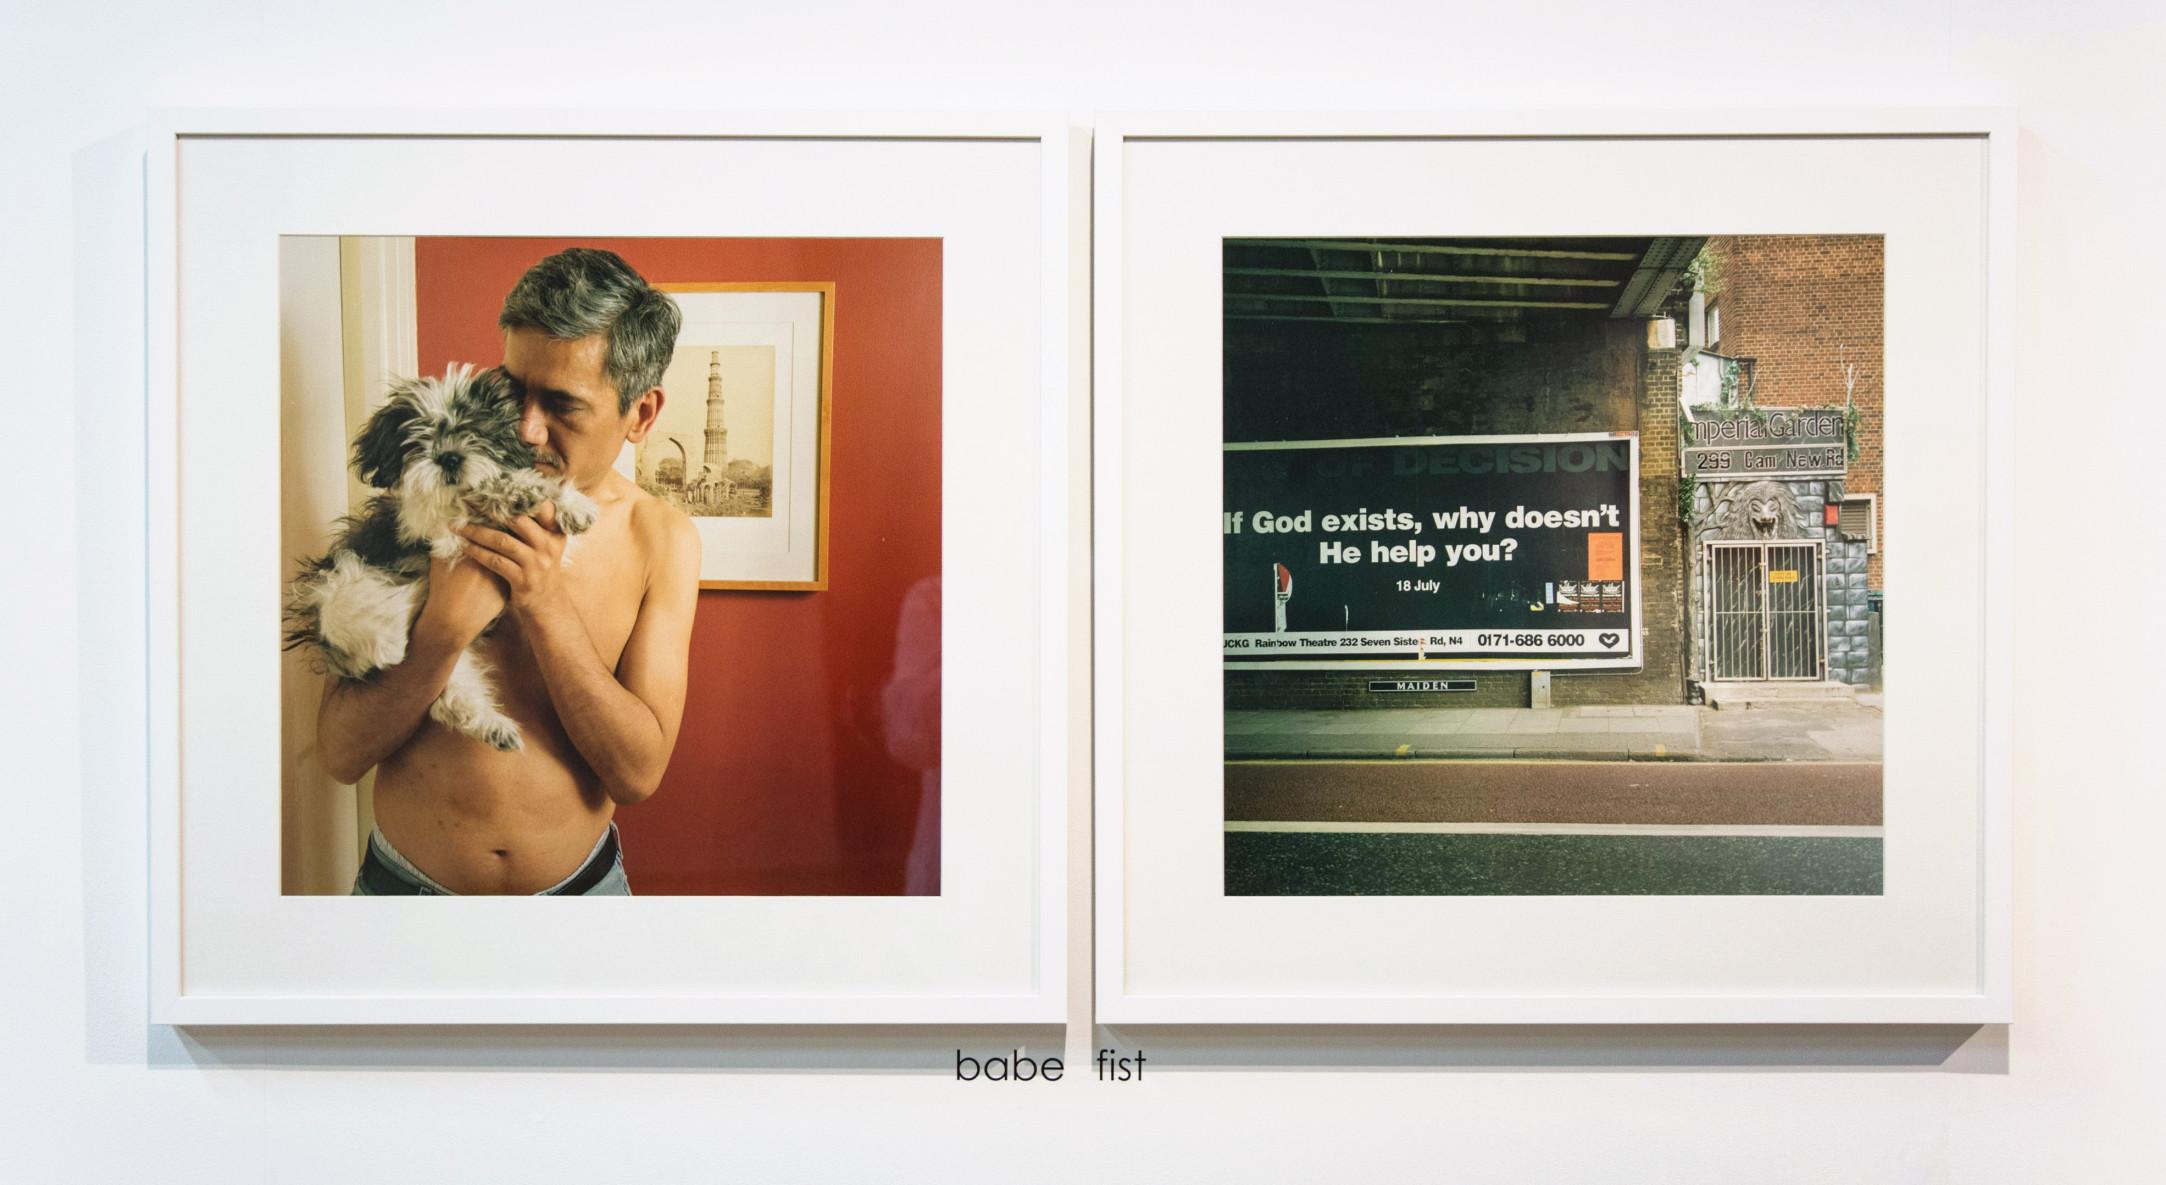 Sunil Gupta, Babe / Fist, 1999 / 2015